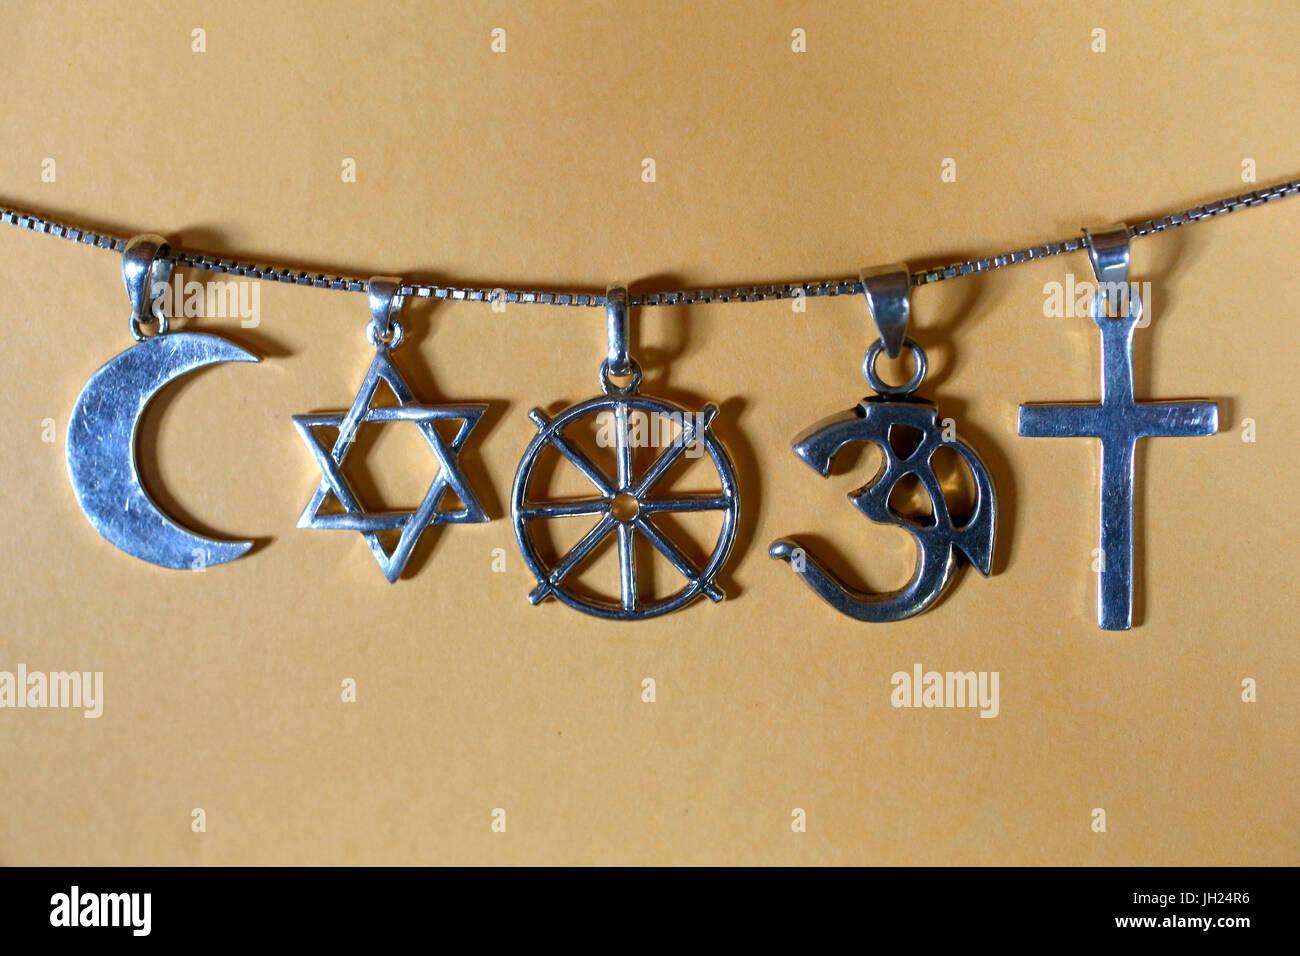 Symbols of islam, judaism, buddhism, hinduism and christianity. - Stock Image